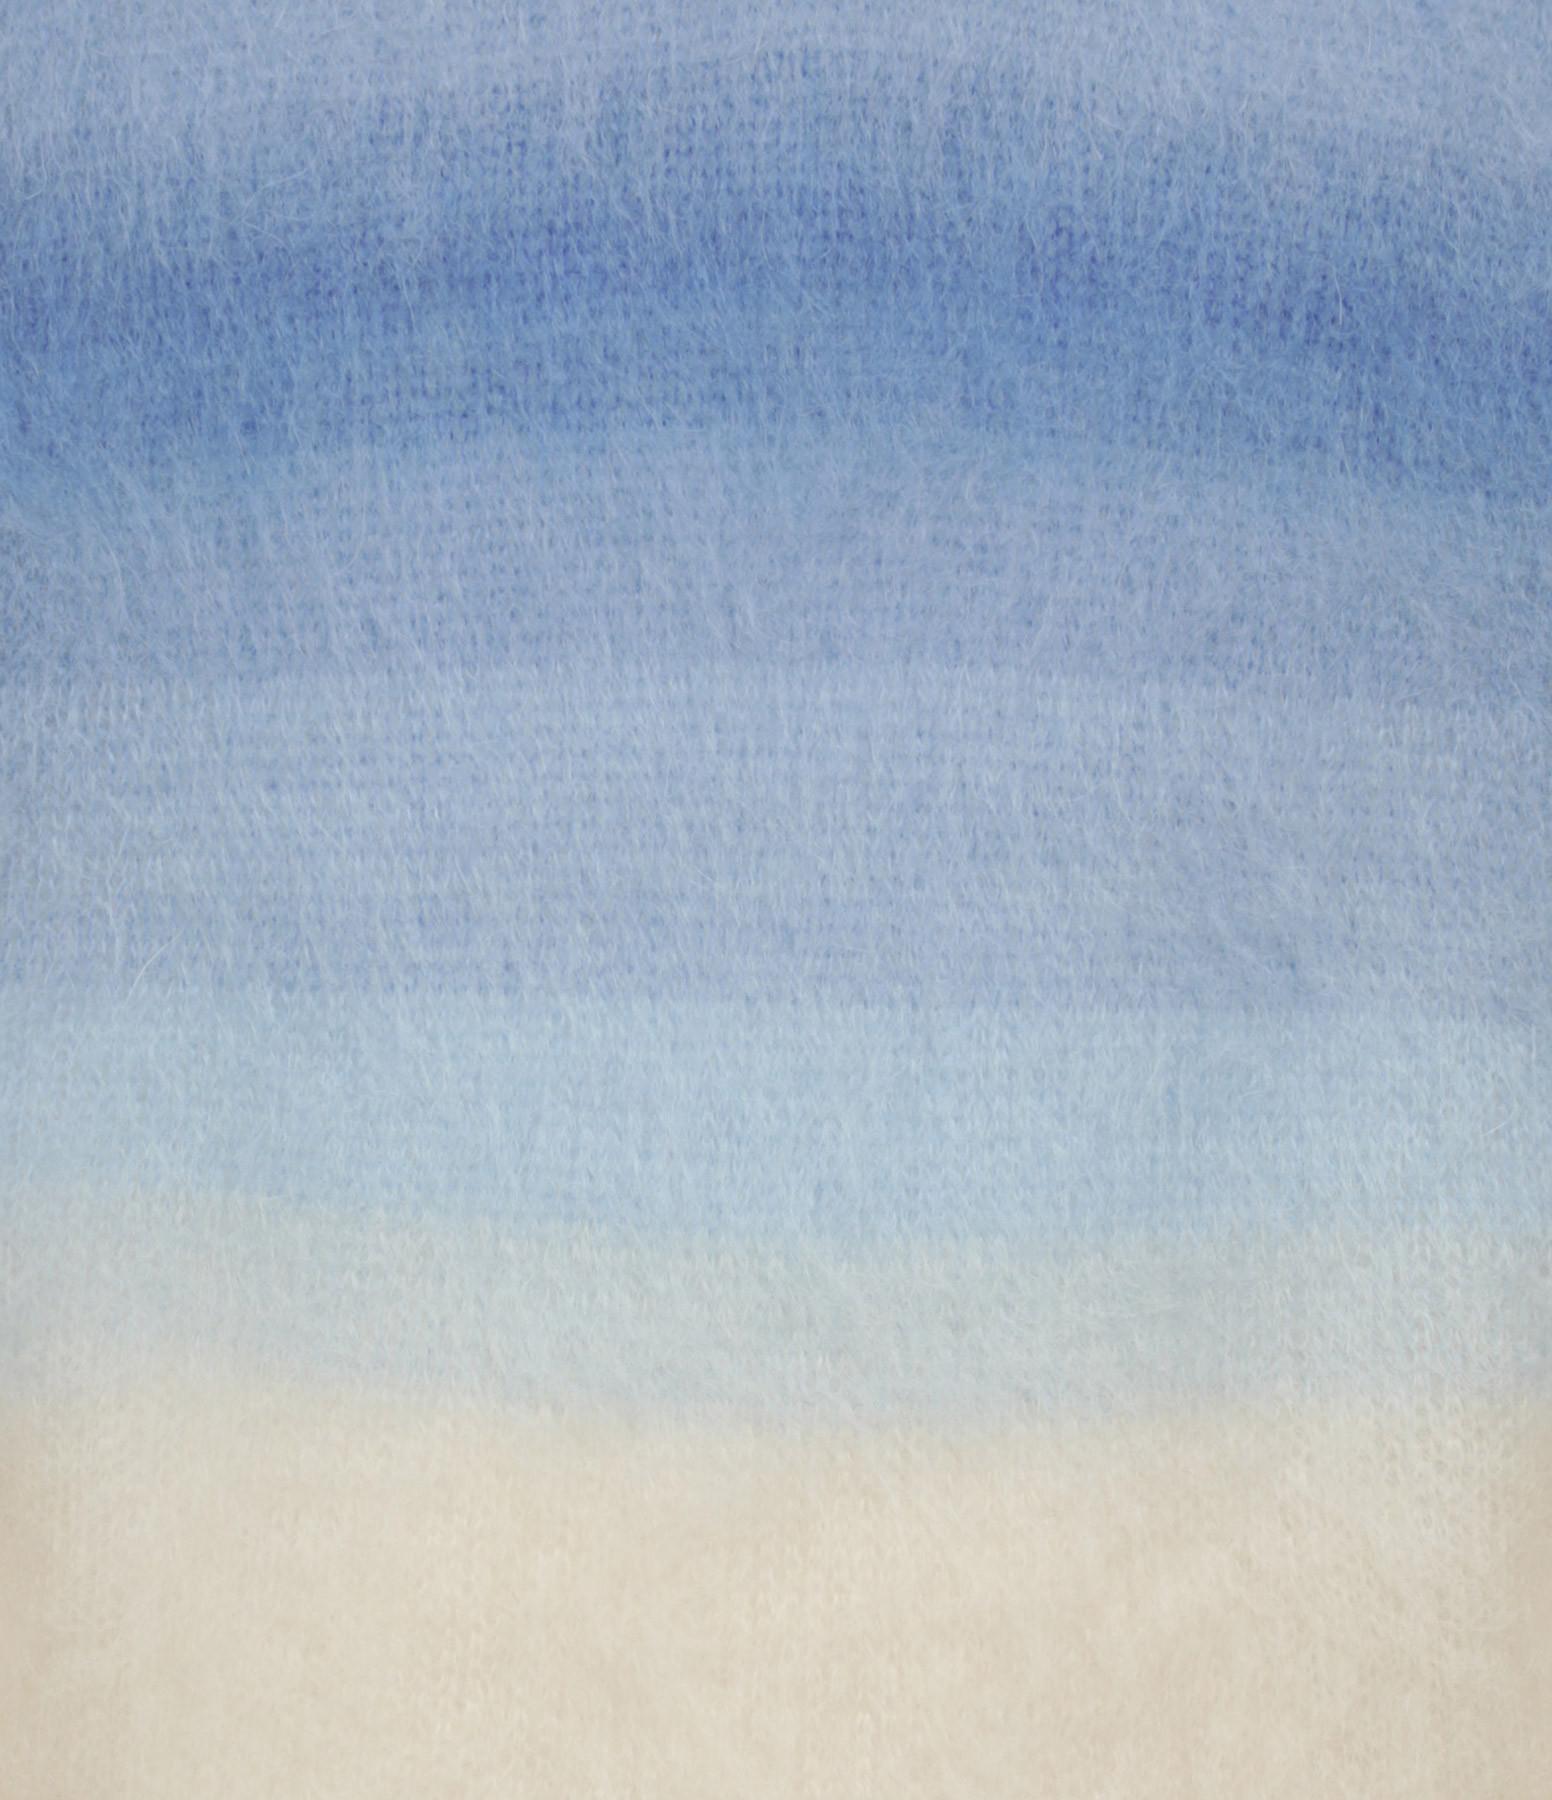 ISABEL MARANT ÉTOILE - Pull Delphi Mohair Bleu